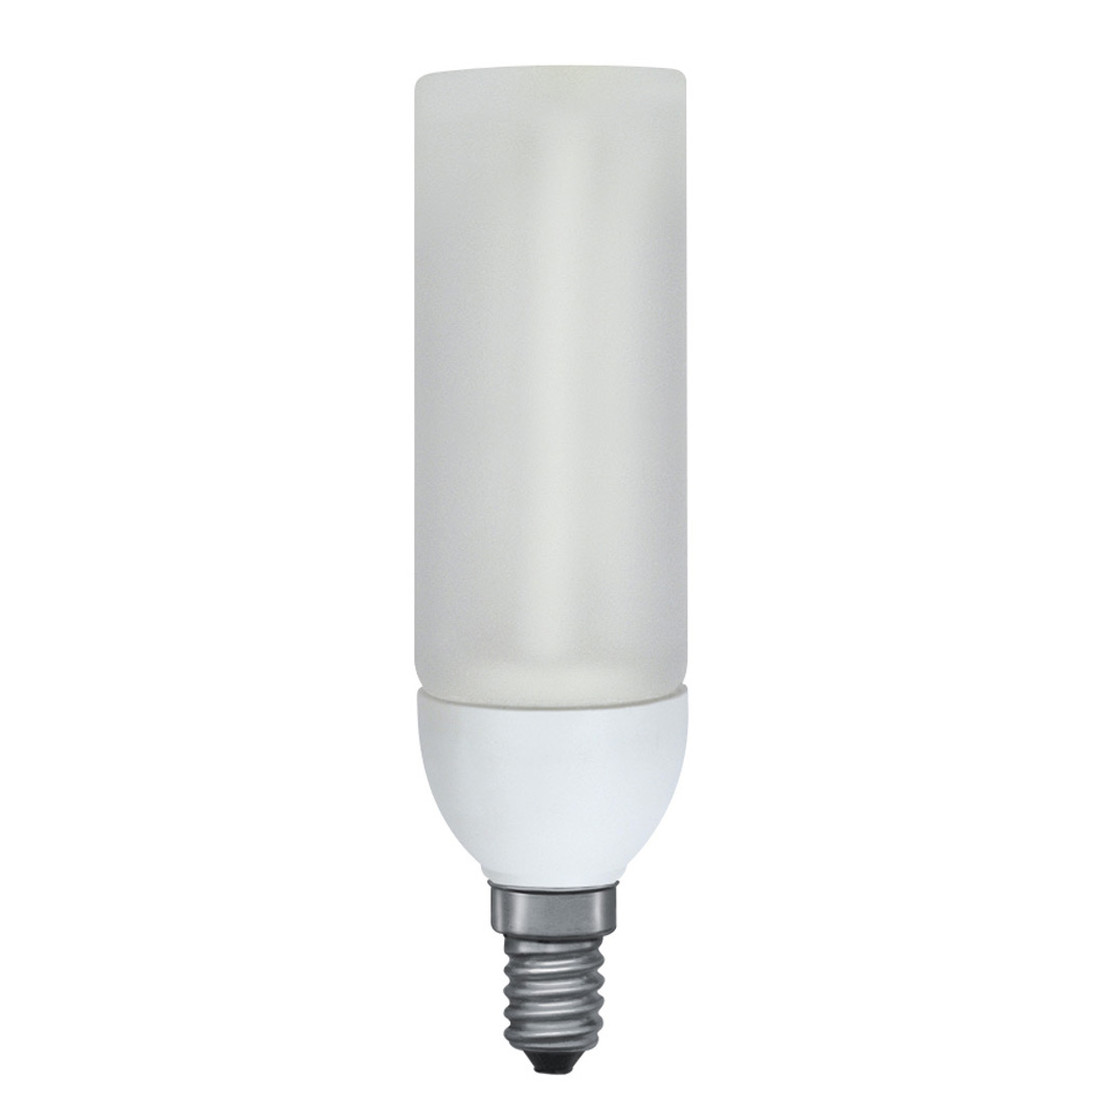 paulmann decopipe energiesparlampe 9w warmweiss e14 lampen r 10 99. Black Bedroom Furniture Sets. Home Design Ideas